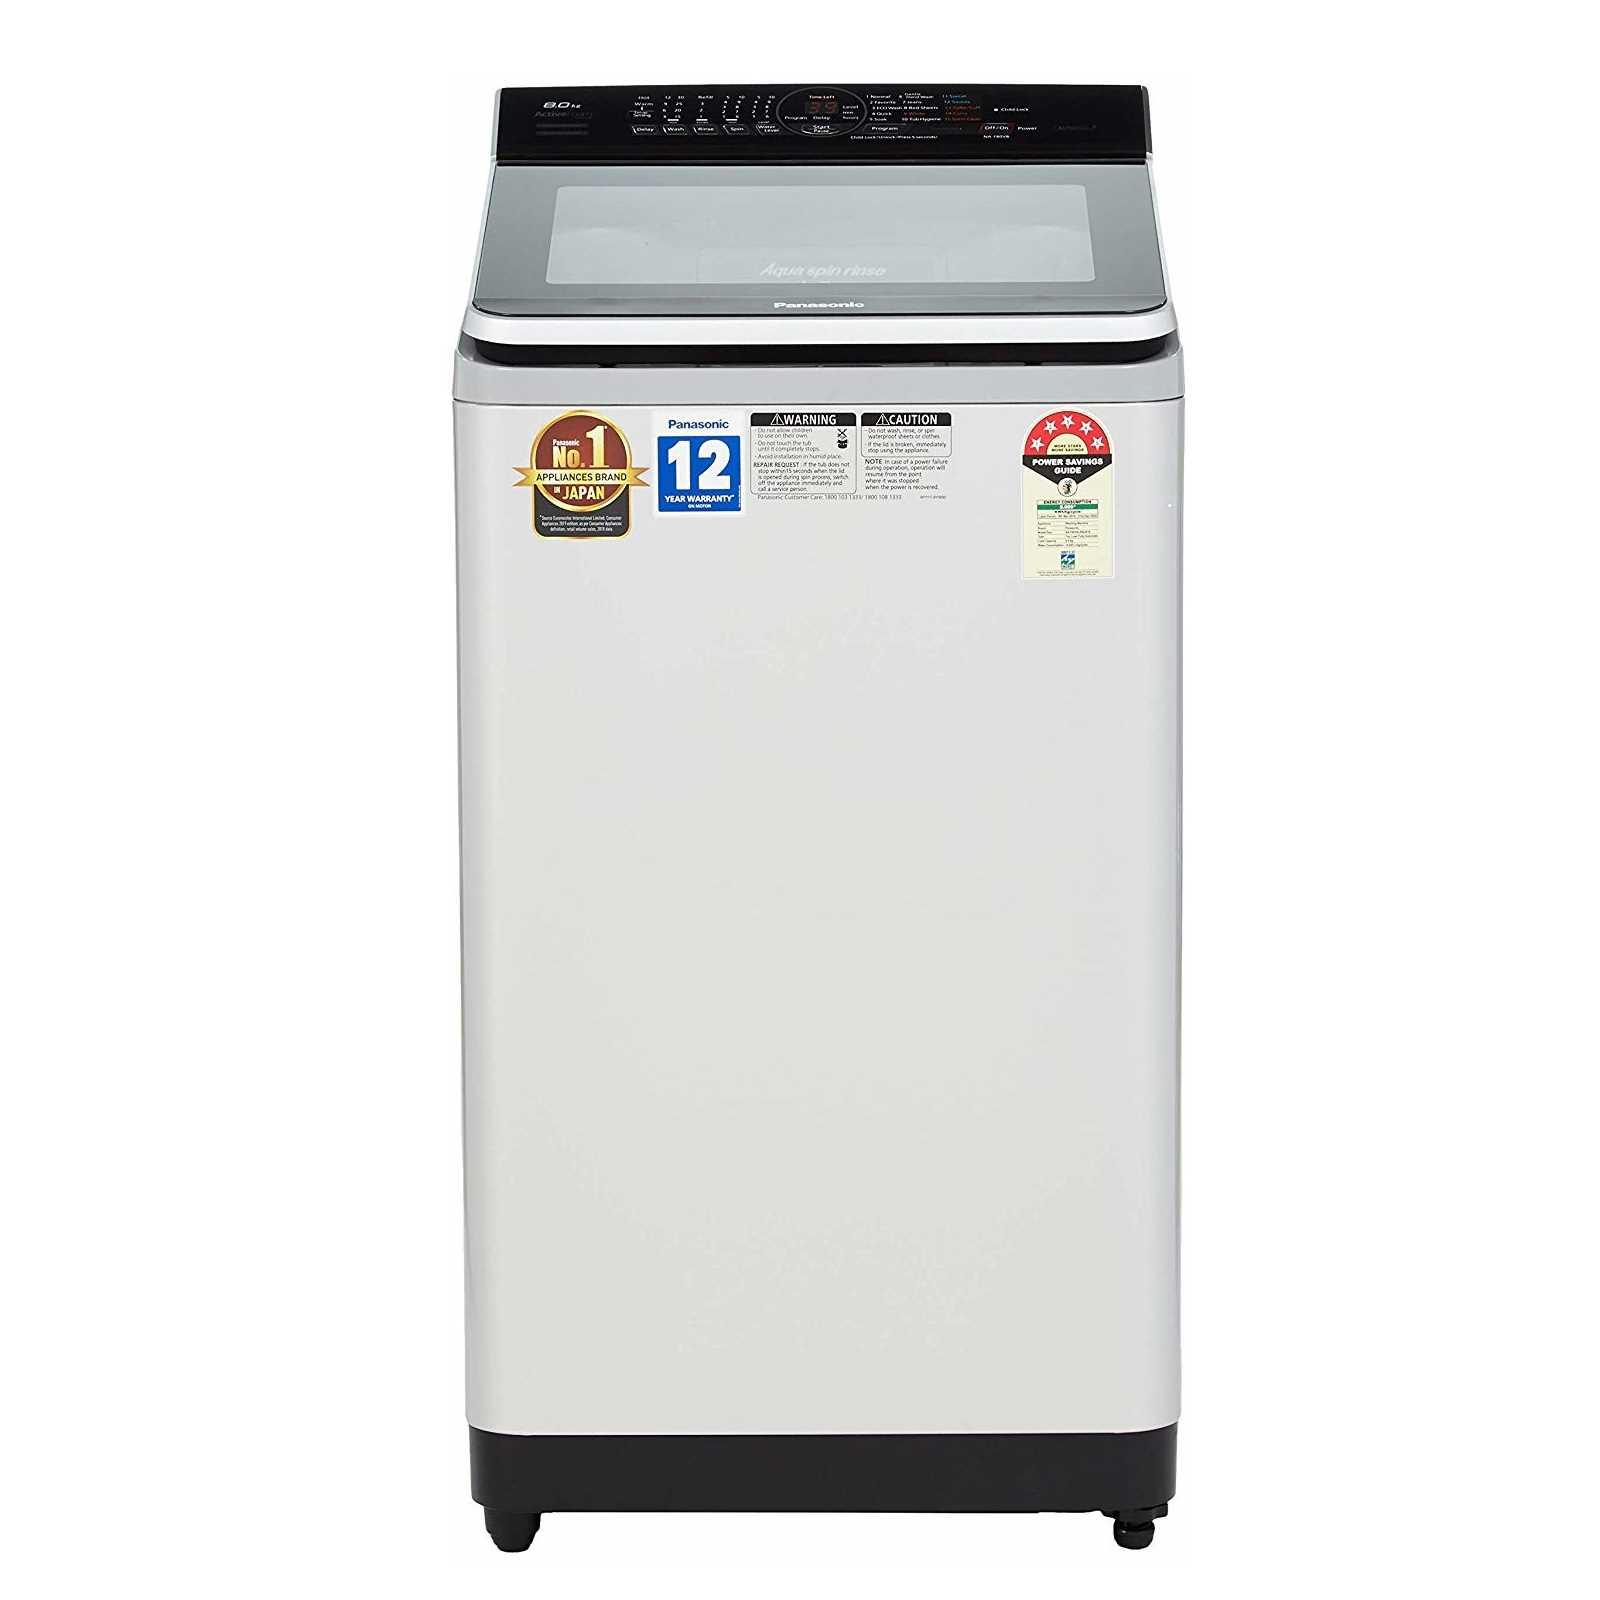 Panasonic NA F80V8 8 Kg Fully Automatic Top Loading Washing Machine